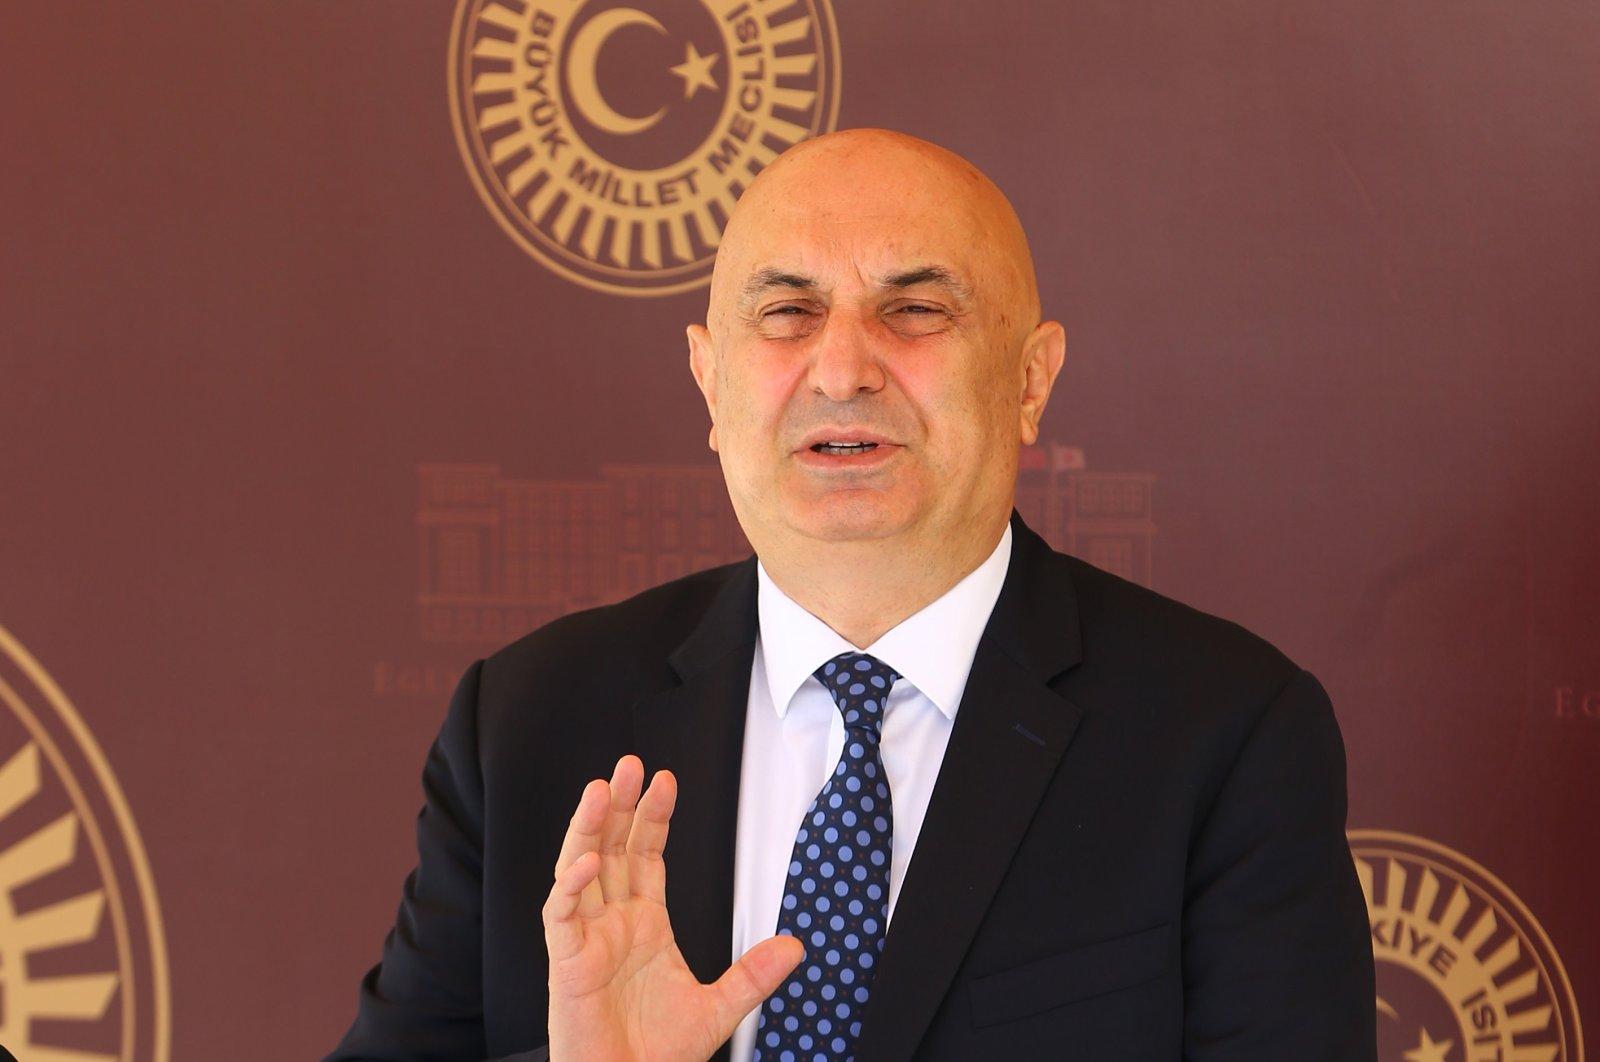 CHP Group Deputy Chairman Engin Özkoç speaks to reporters at Parliament, Ankara, Turkey, July 30, 2020 (AA Photo)